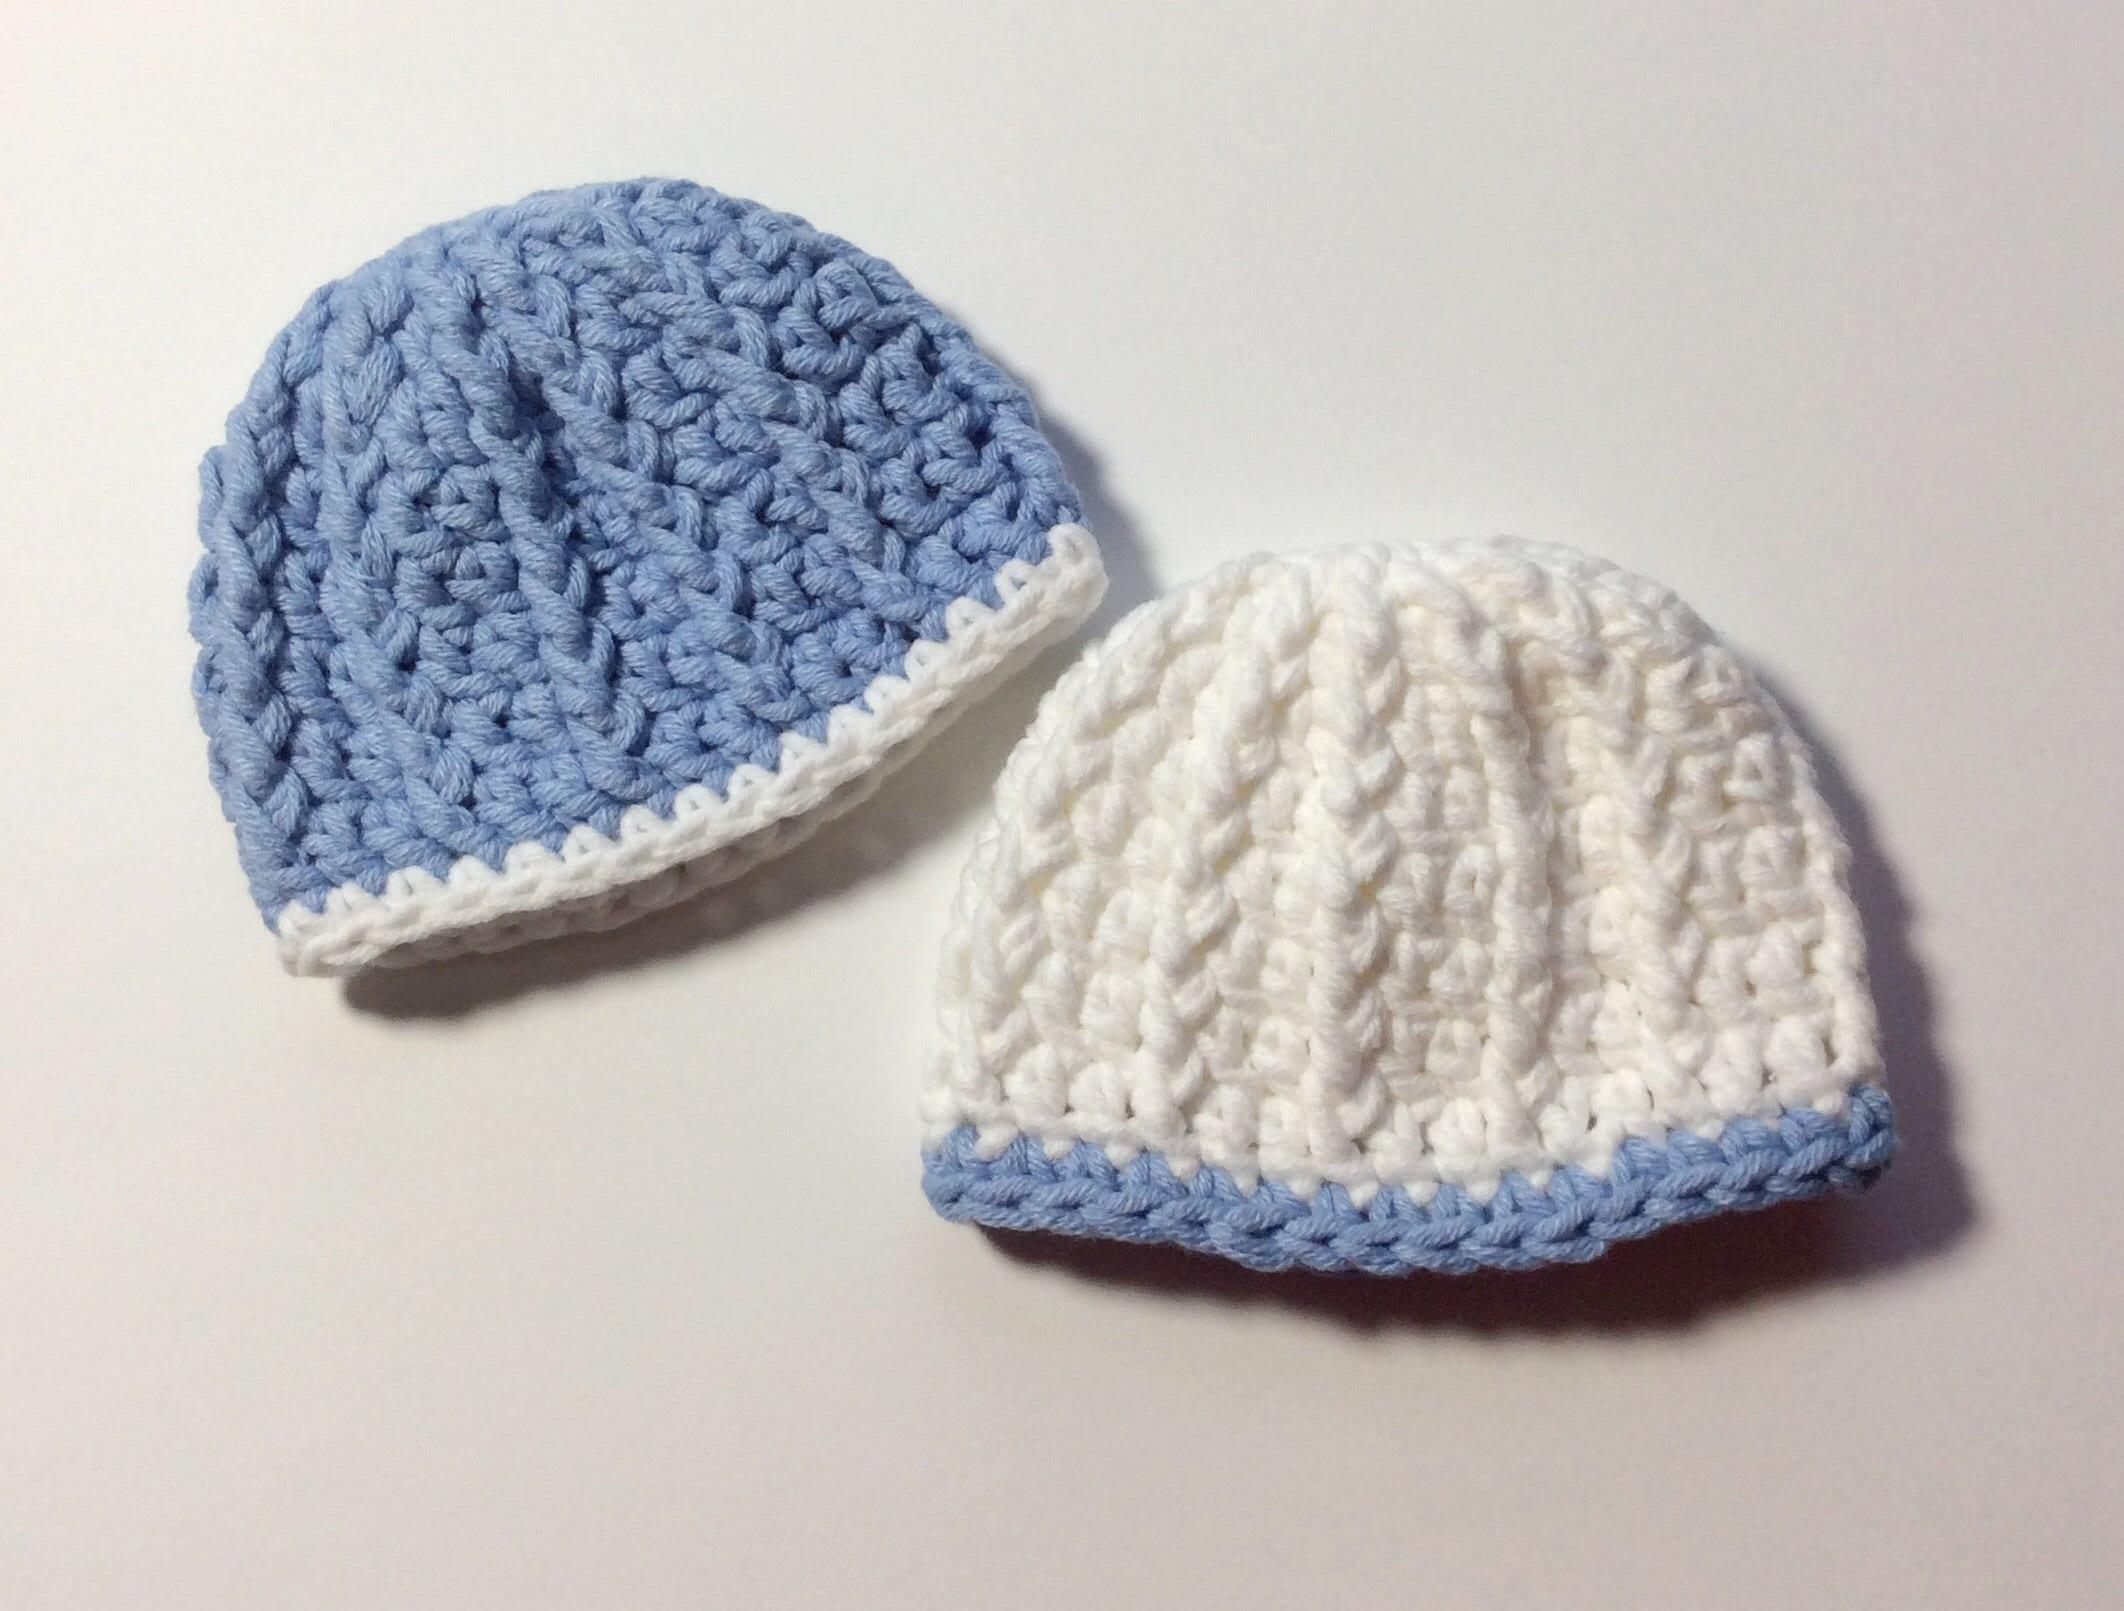 Micro preemie hats baby boy preemie hats twins preemie hats etsy jpg  2124x1611 Micro preemie hat c6390e9854e